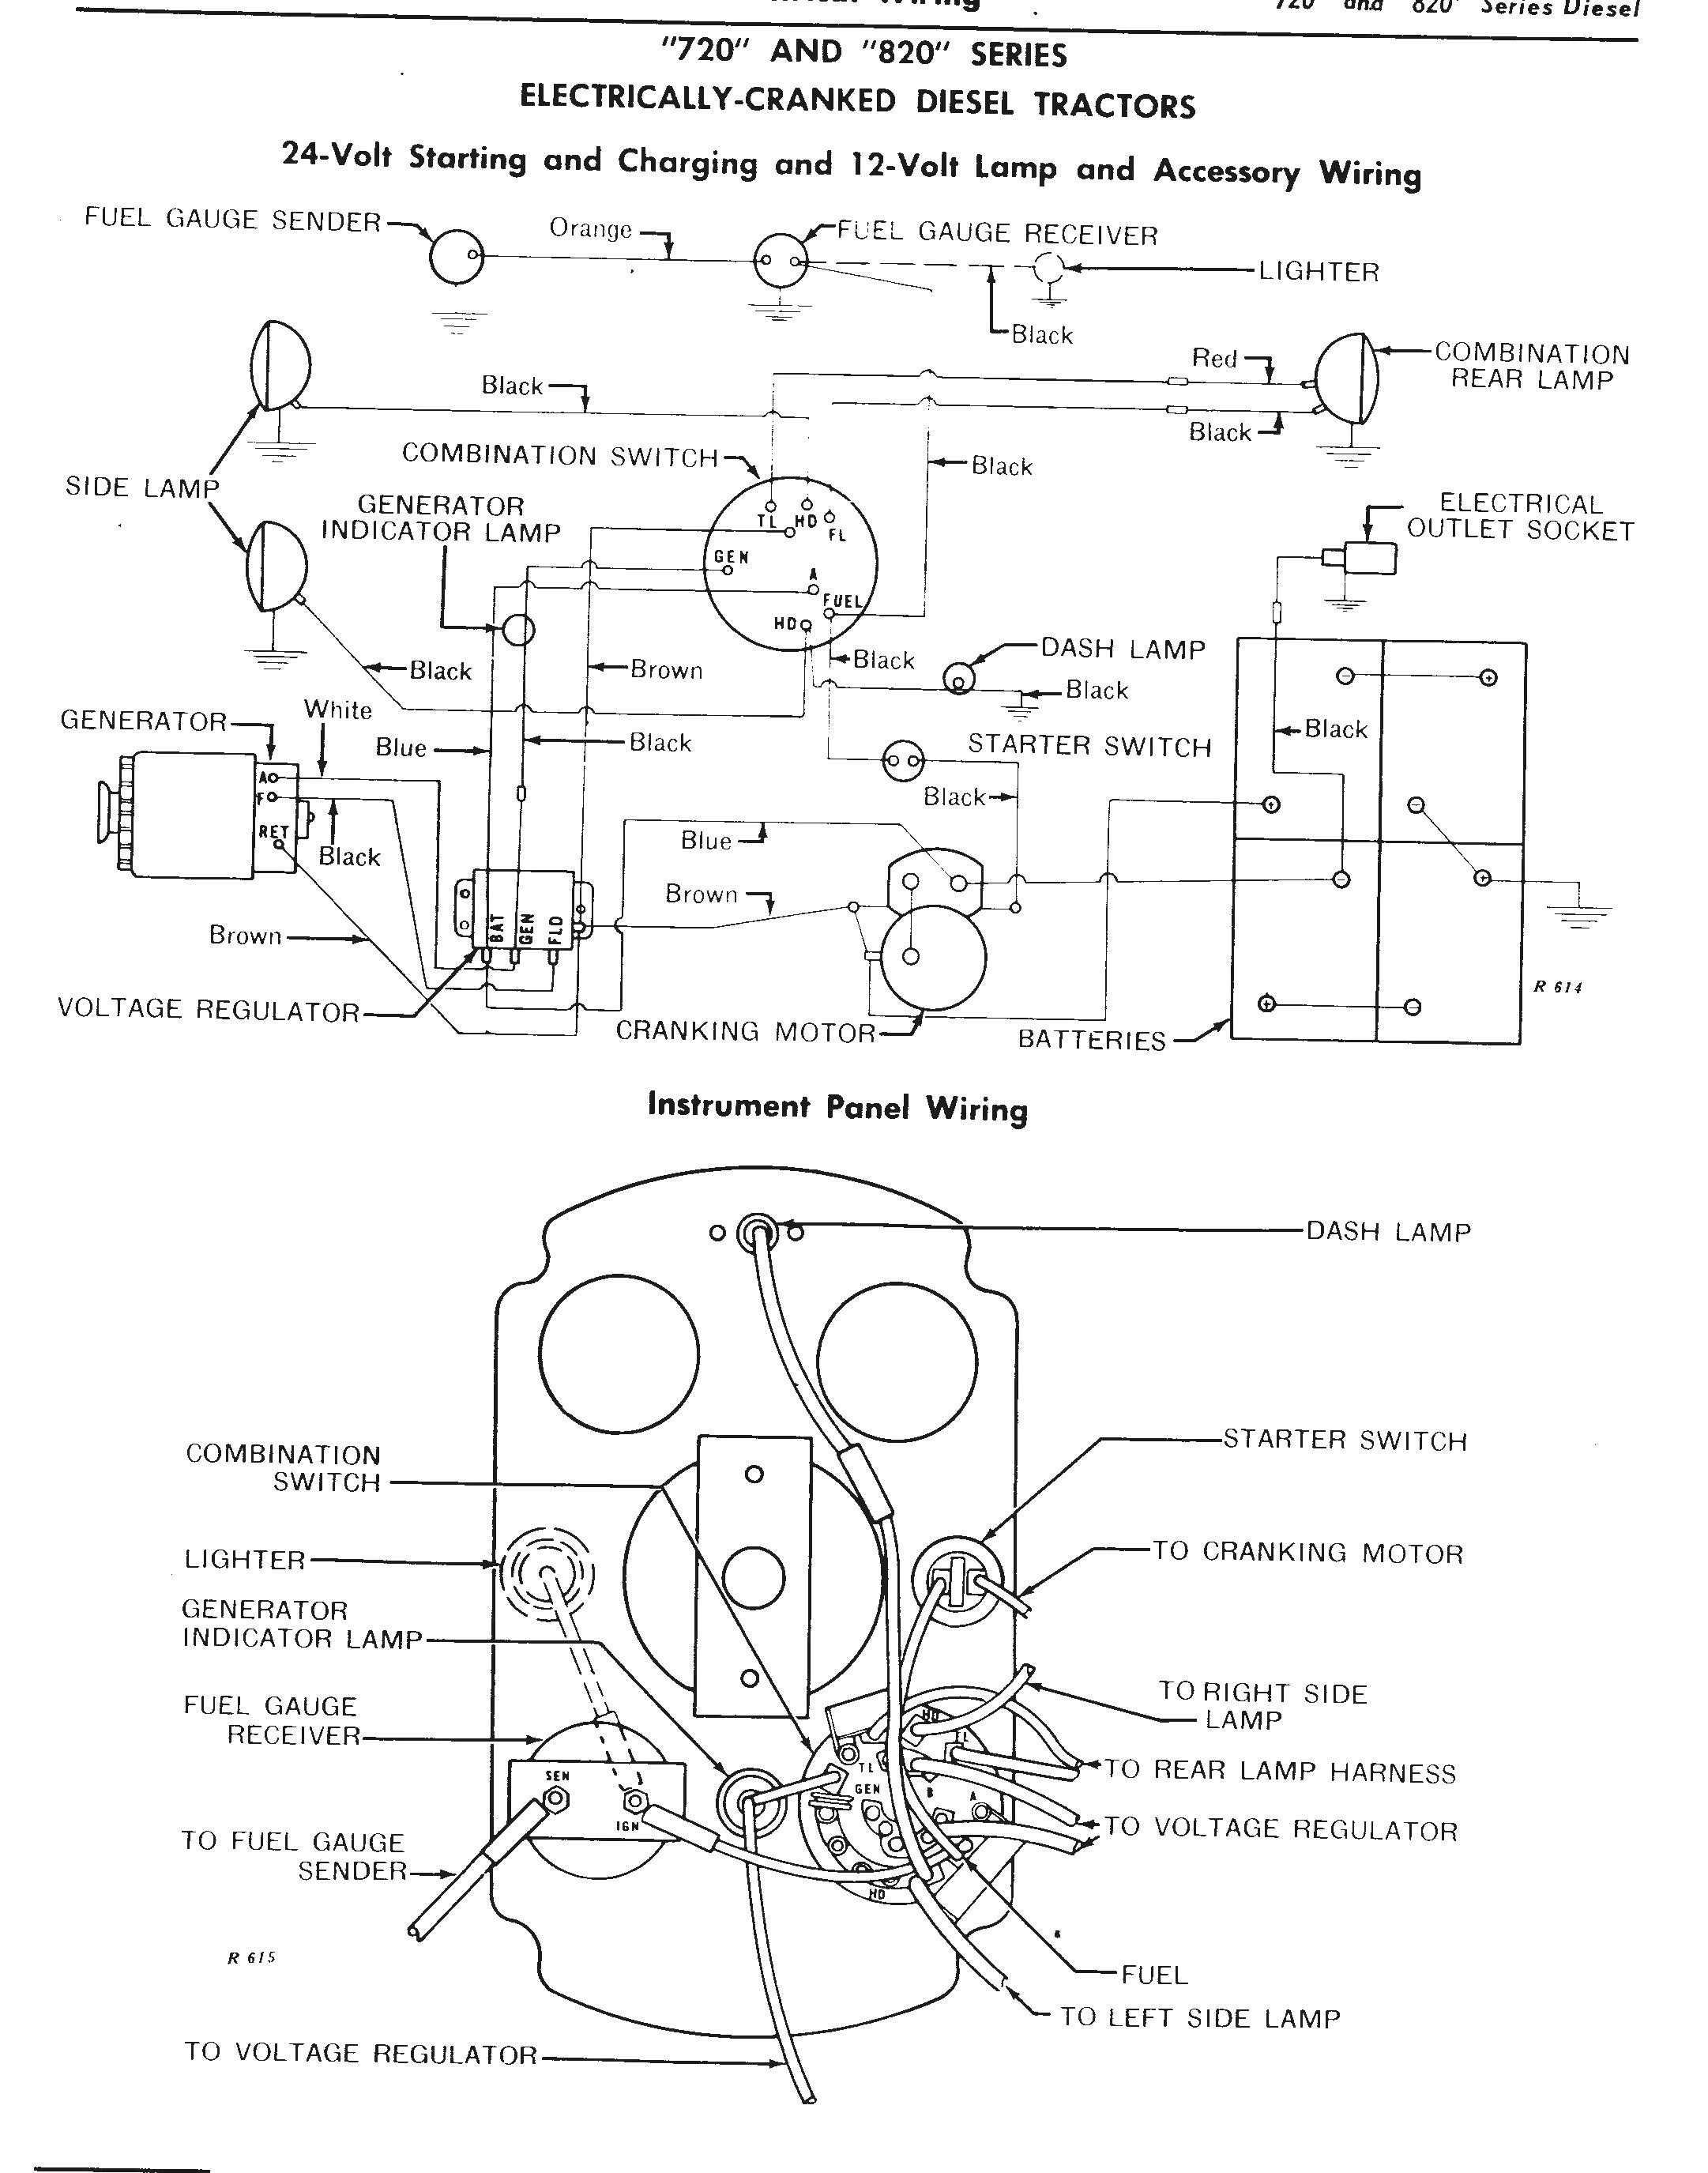 Pleasing The John Deere 24 Volt Electrical System Explained Wiring Cloud Gufailluminateatxorg